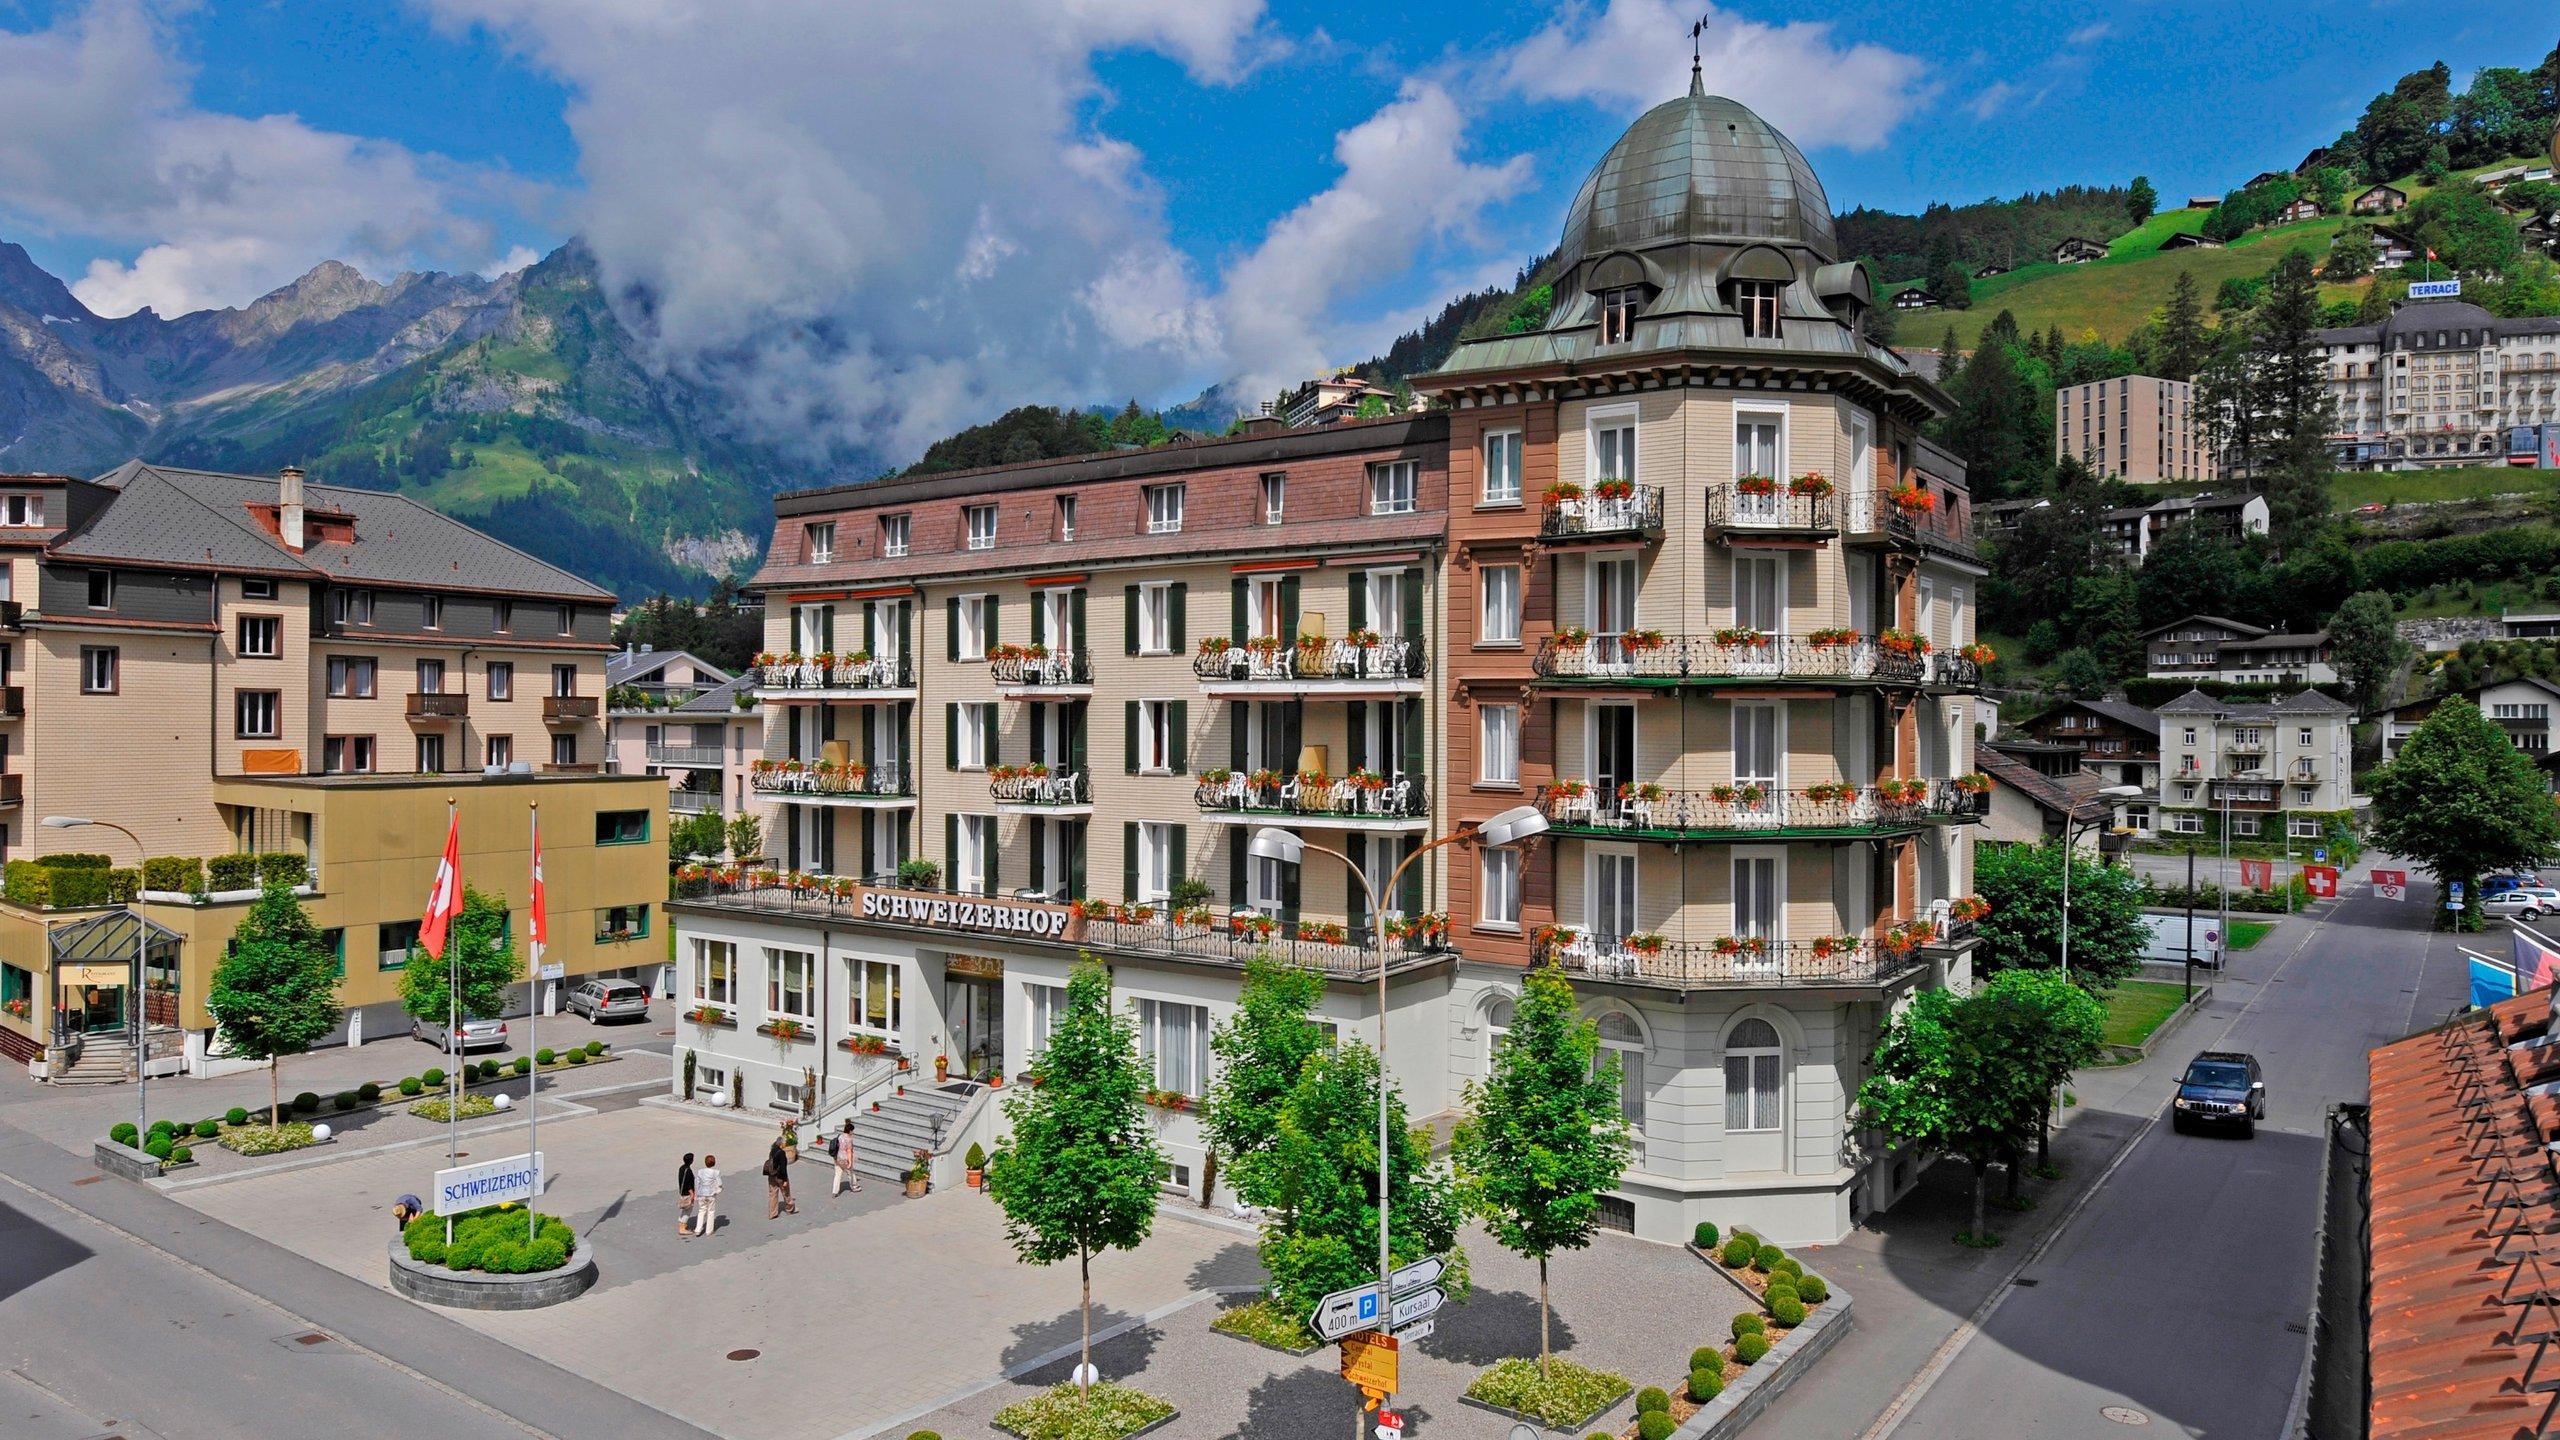 Engelberg, Canton of Obwalden, Switzerland